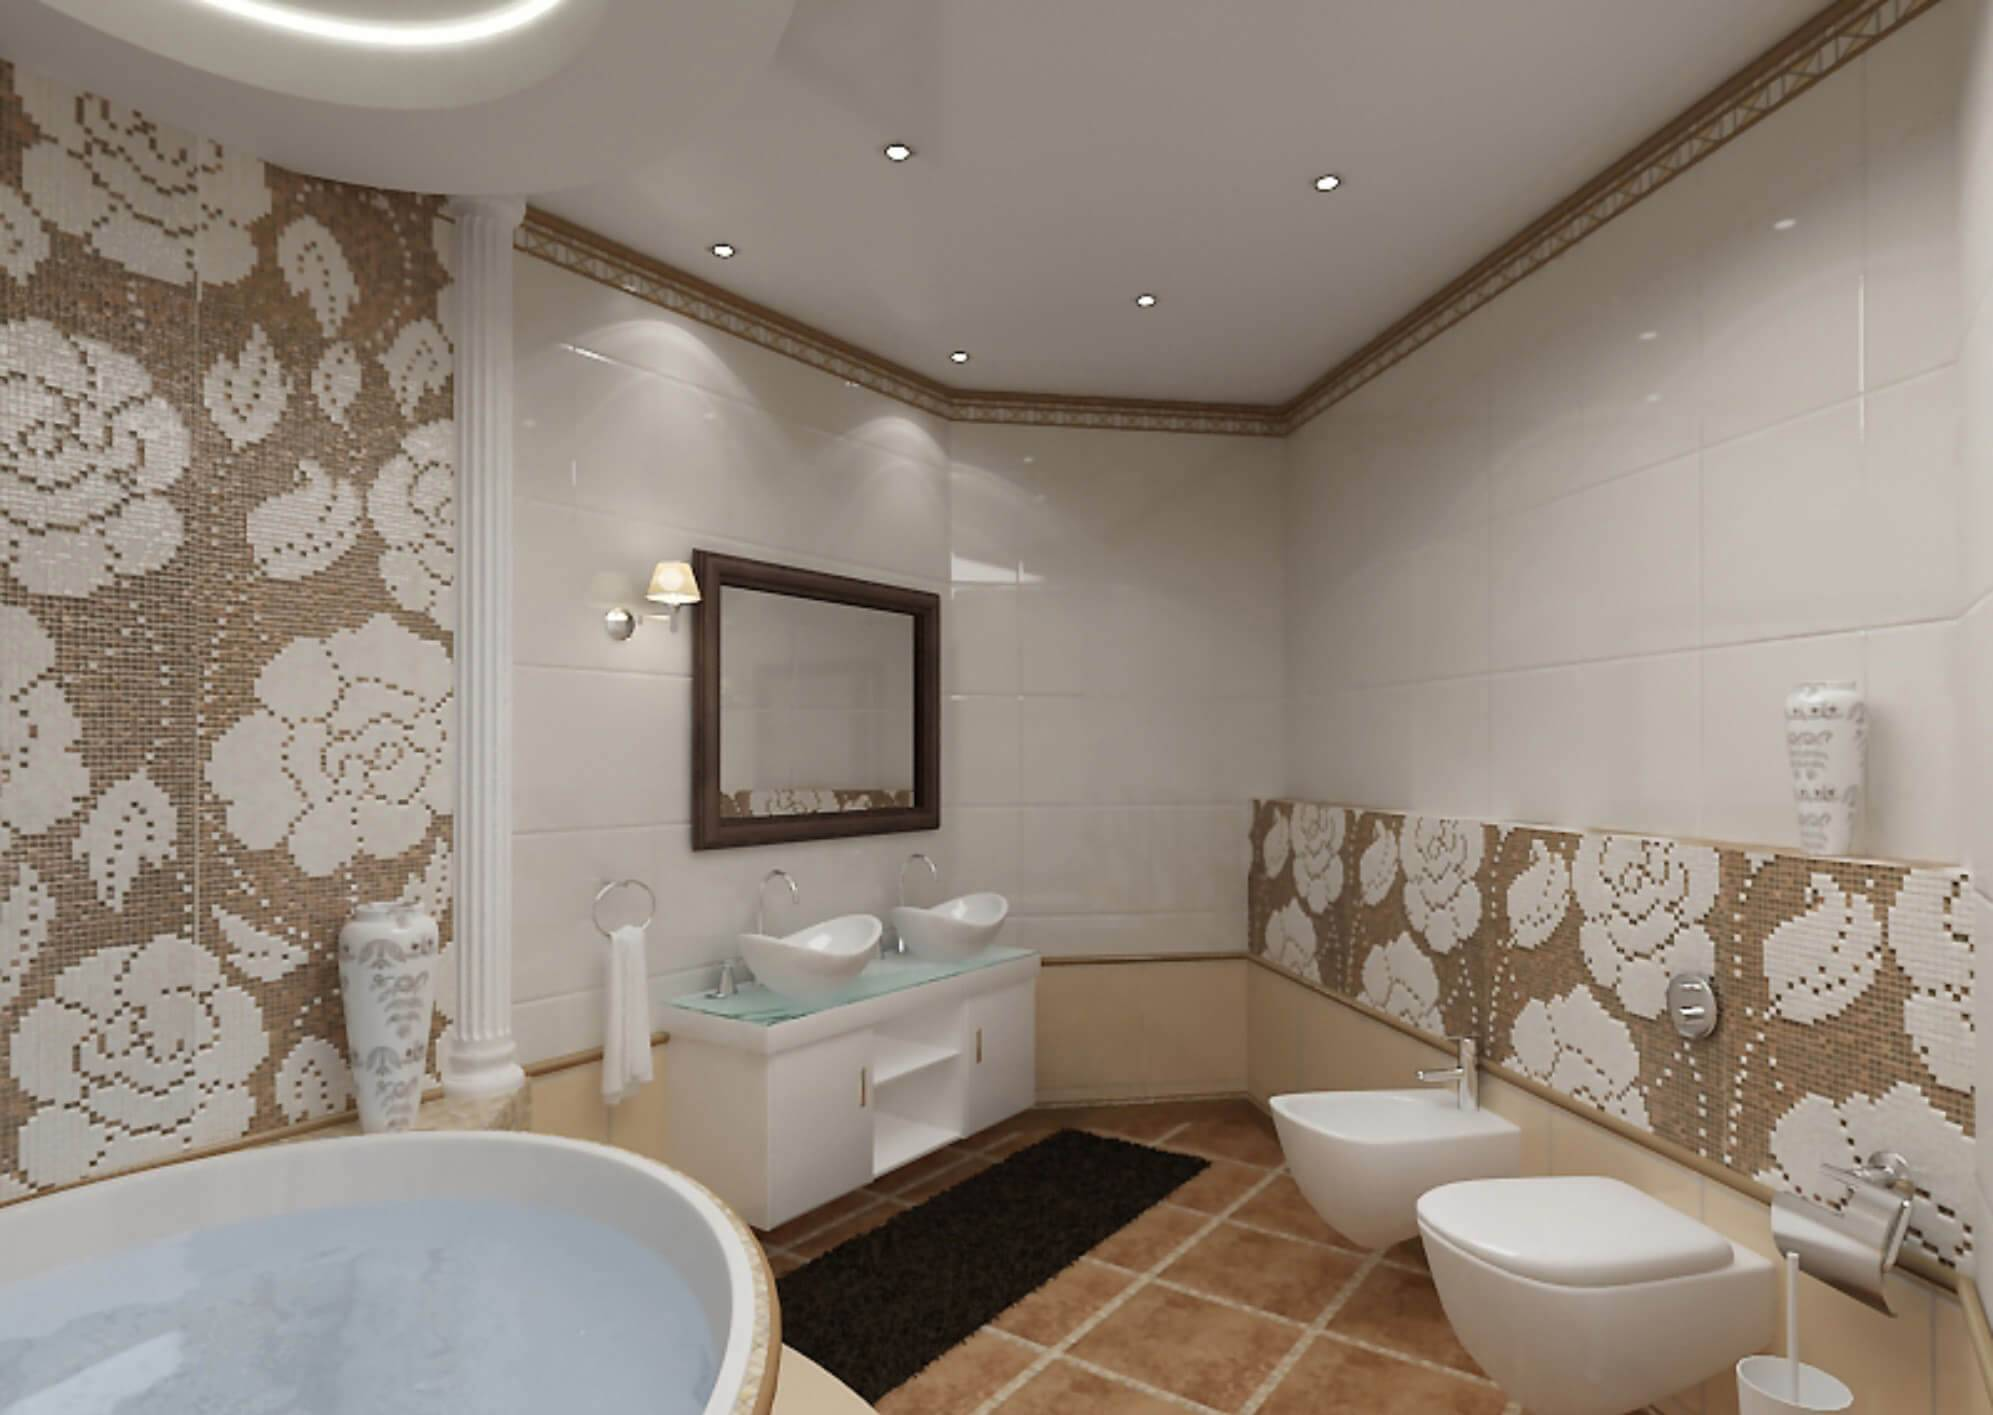 Выбор и ремонт потолка в туалете